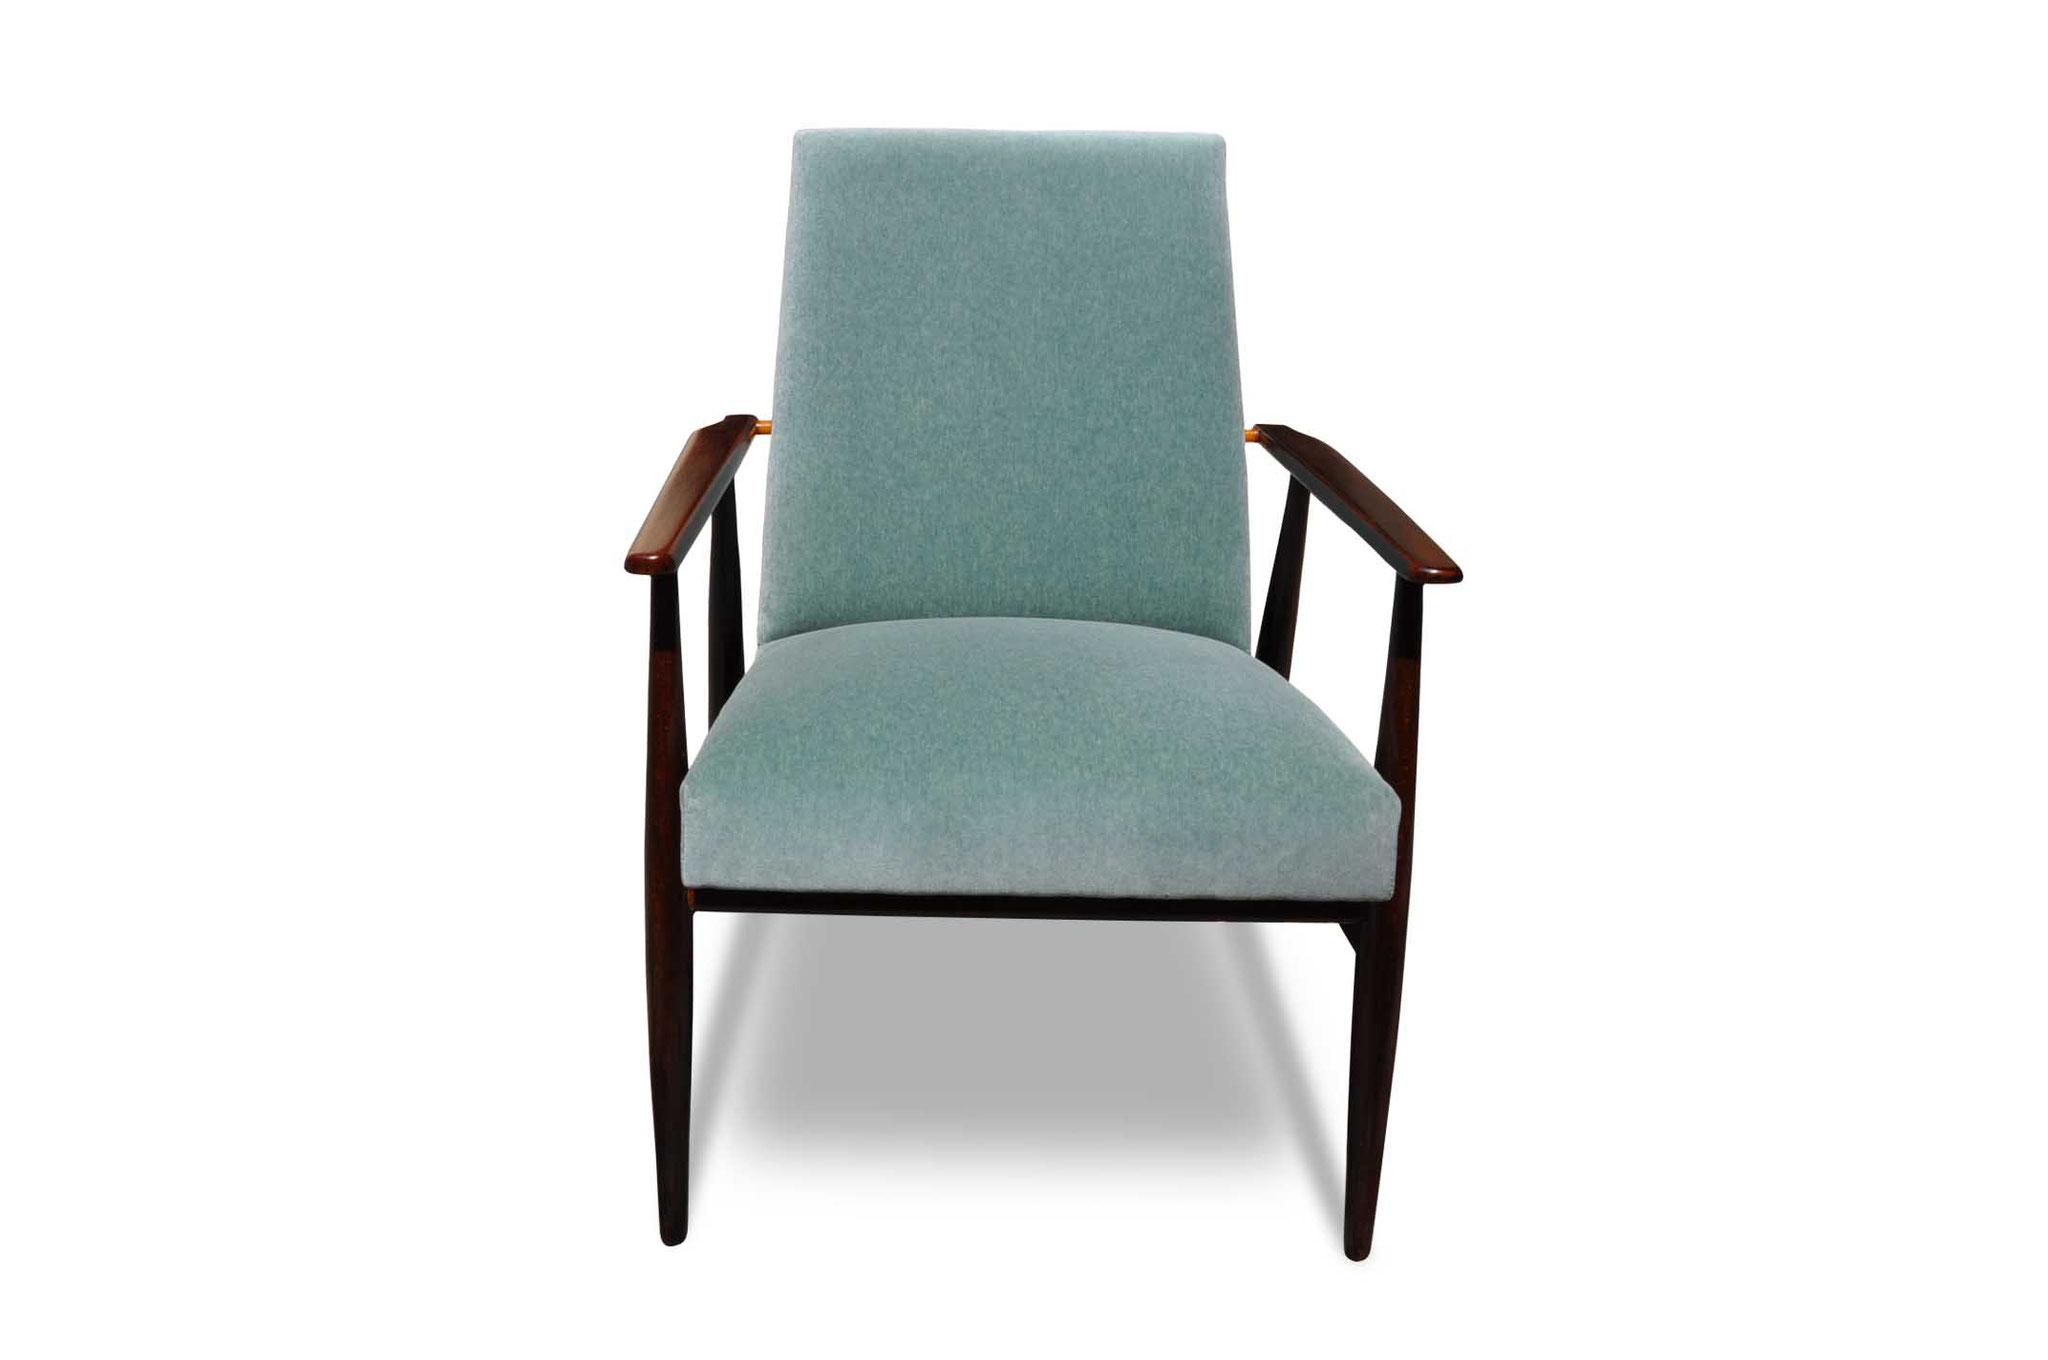 Scandinavian Retro Chair Mid Century Modern Original